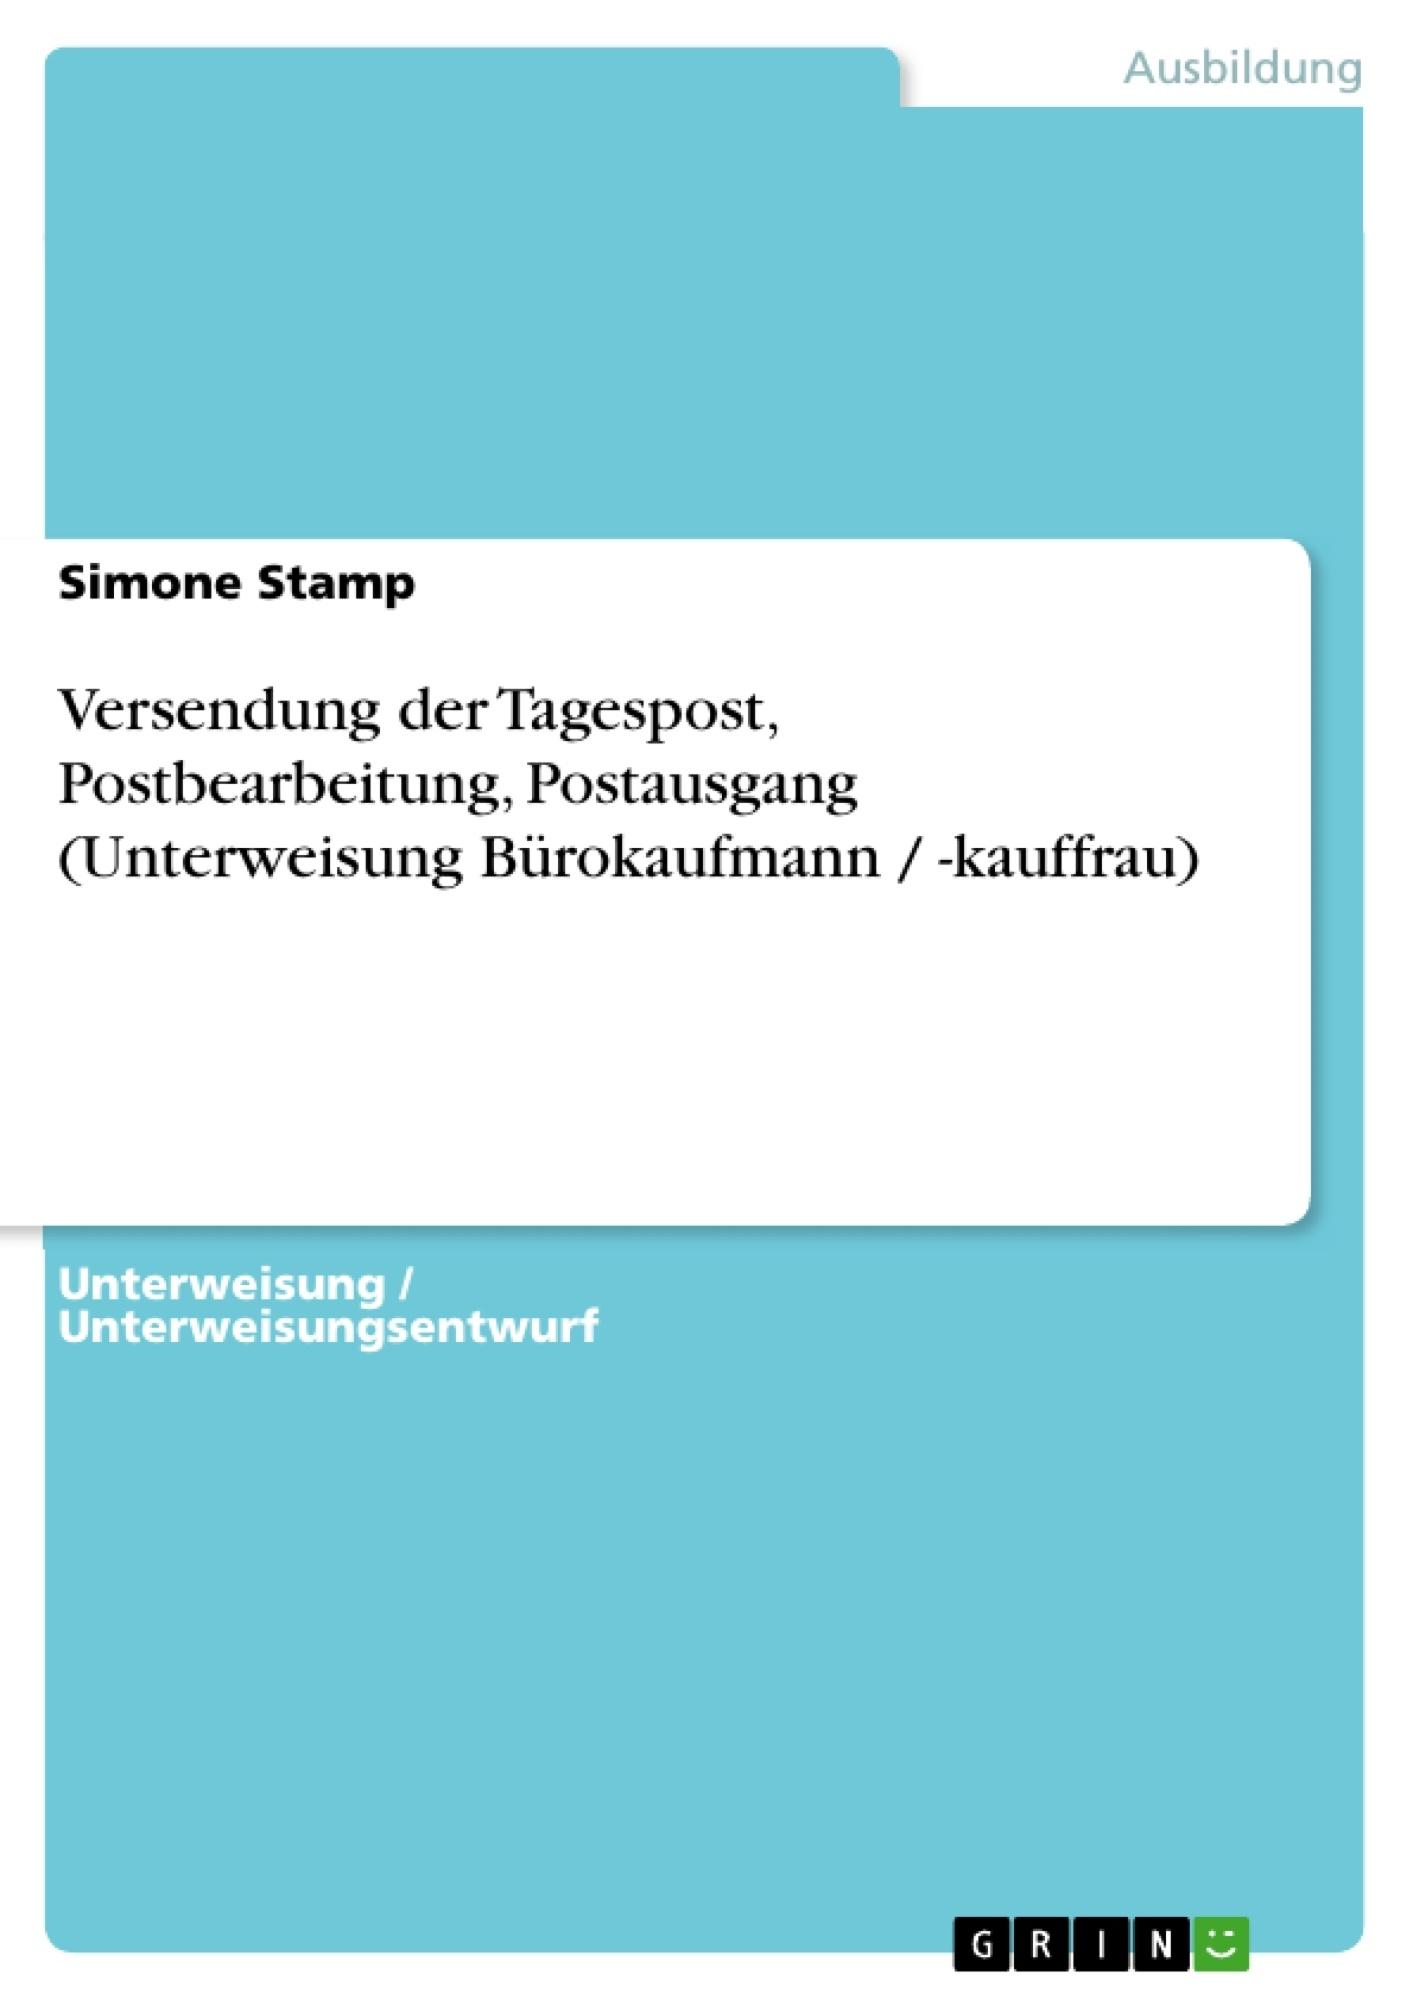 Titel: Versendung der Tagespost, Postbearbeitung, Postausgang (Unterweisung Bürokaufmann / -kauffrau)